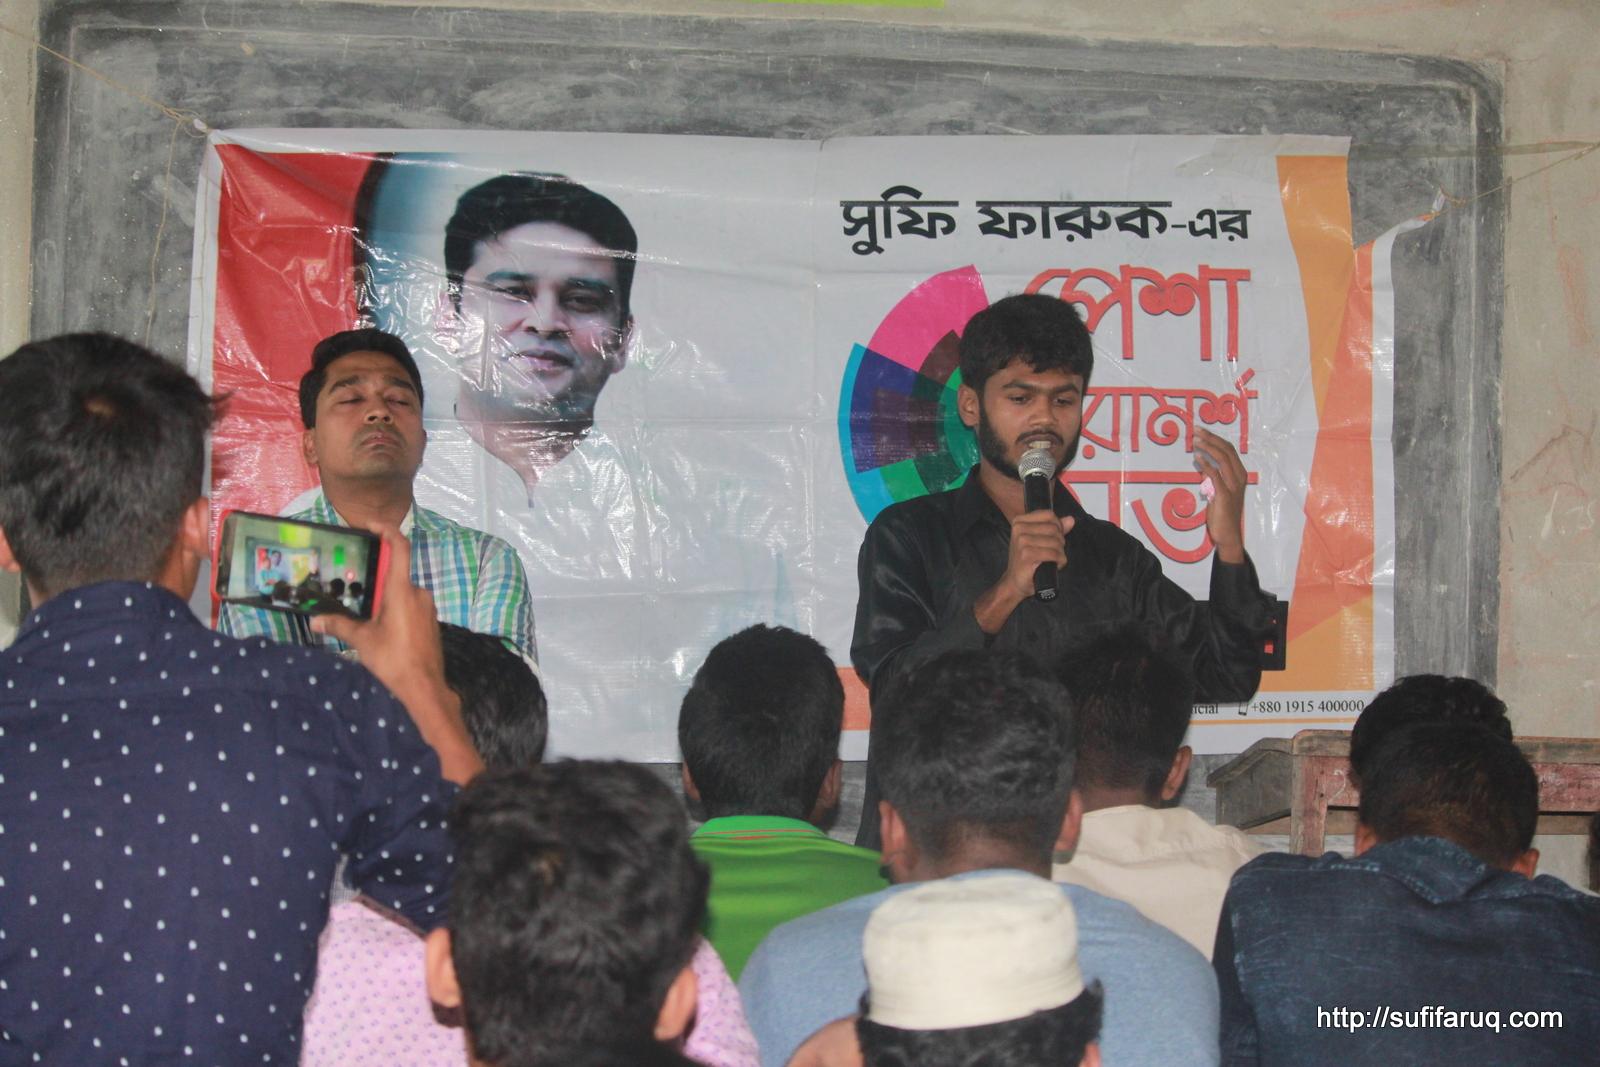 "Ramanathpur School Pesha Poramorsho Shobha 03.10 30 খোকসা উপজেলার রমানাথপুরে "" সুফি ফারুক এর পেশা পরামর্শ সভা"" অনুষ্ঠিত"